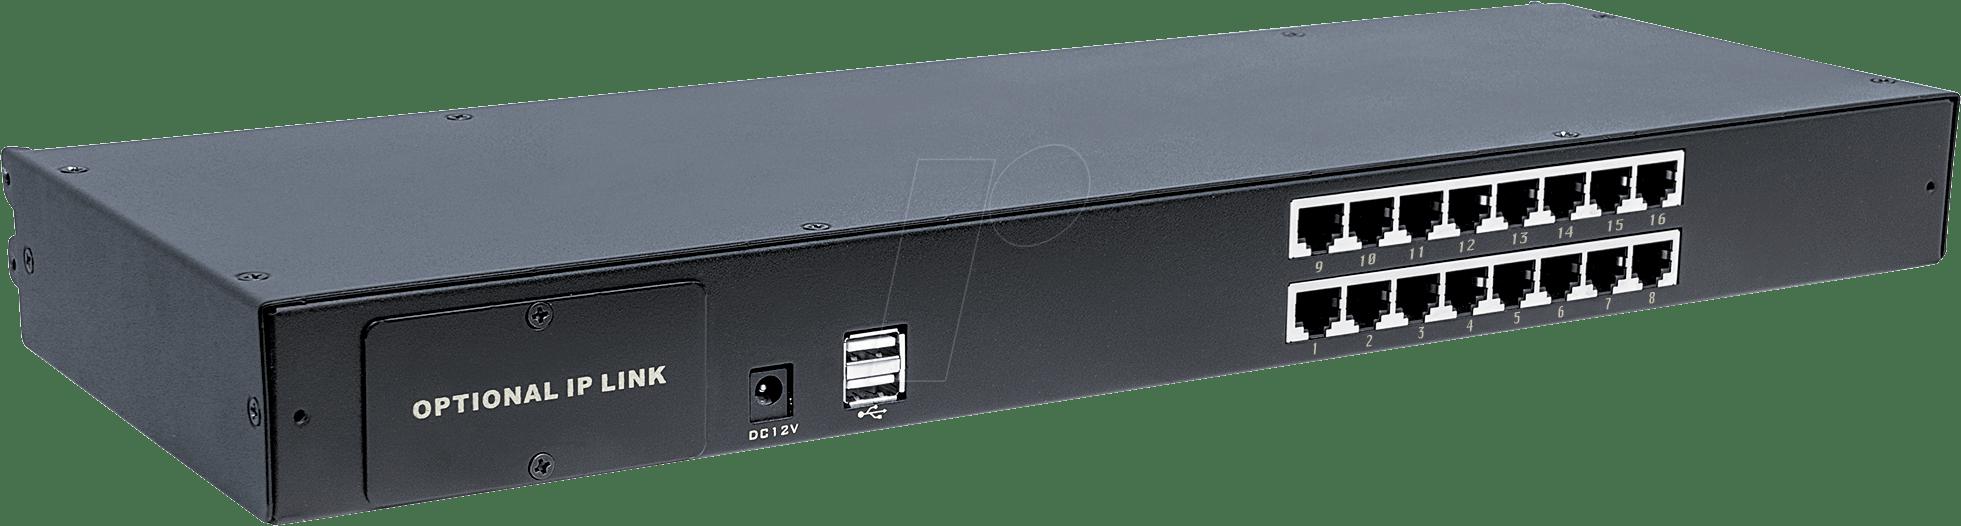 hight resolution of 16 port kvm switch cat5 vga intellinet 507899